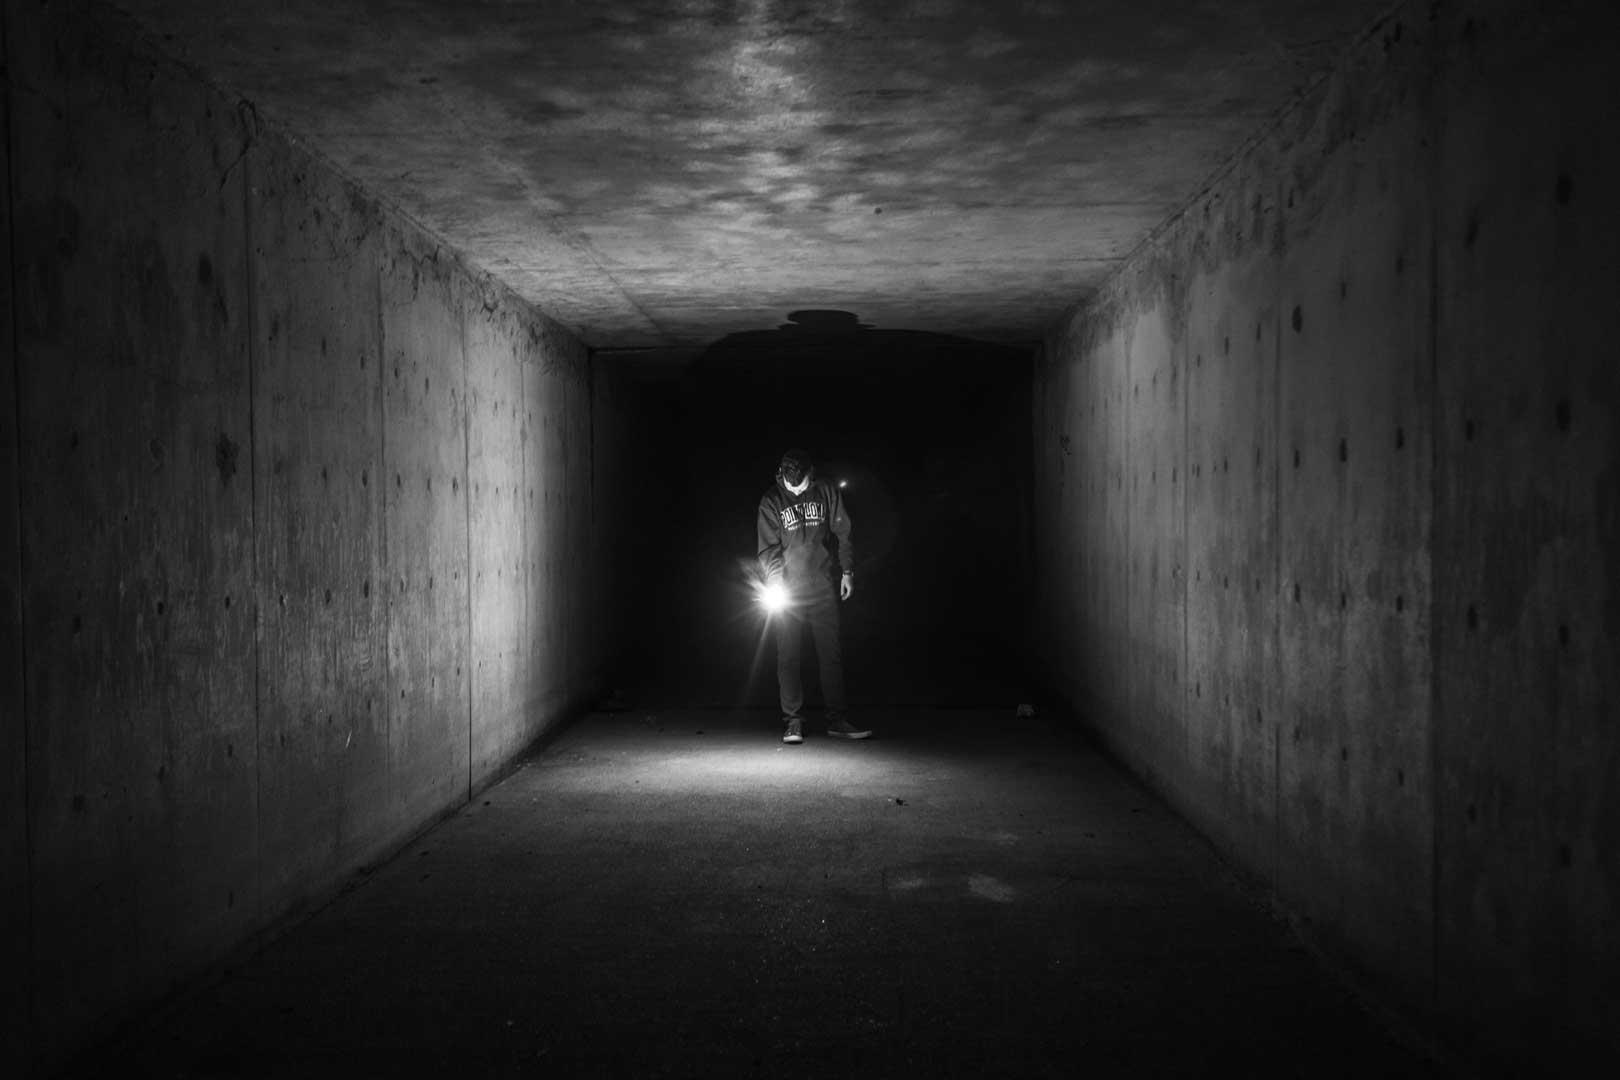 angels walking in tunnel wallpaper - photo #4